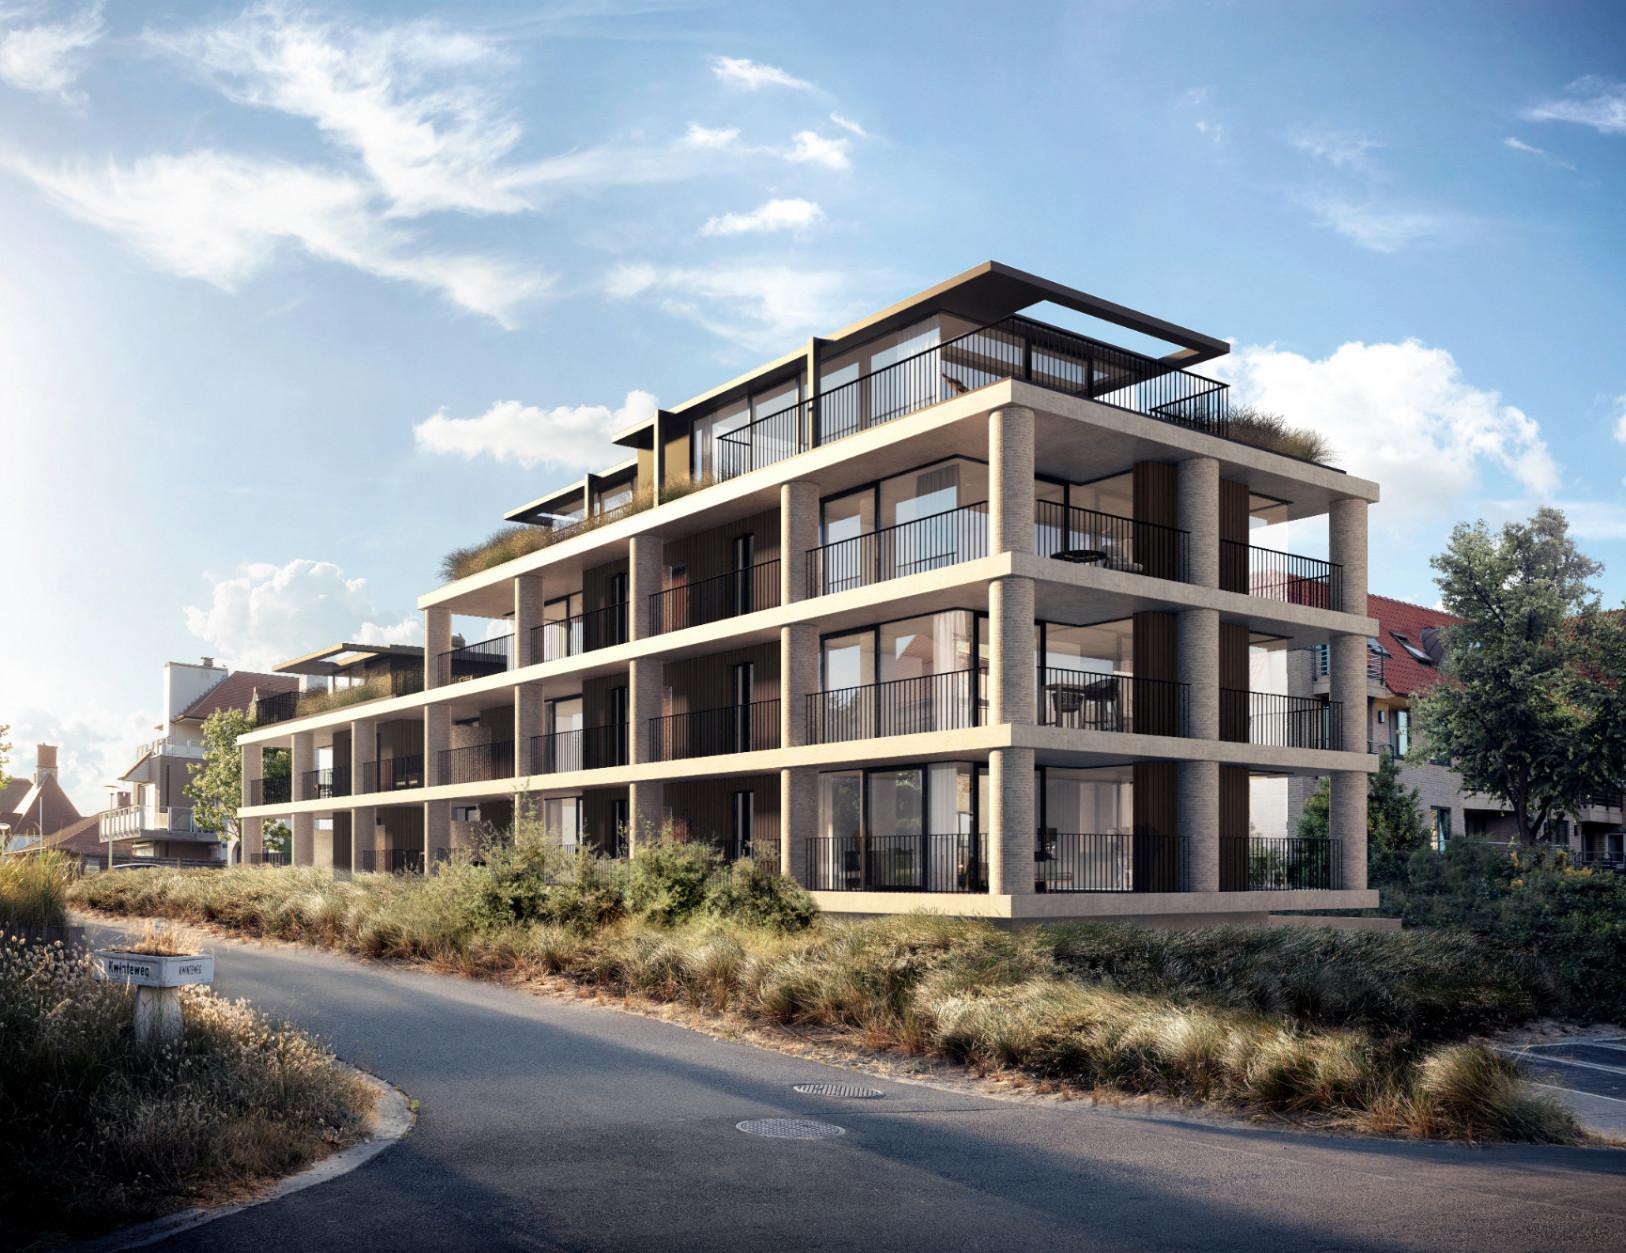 Theo van Doesburg - Oostduinkerke - Te koop - Rietveldprojects - Caan Architecten4_1626x0.jpg